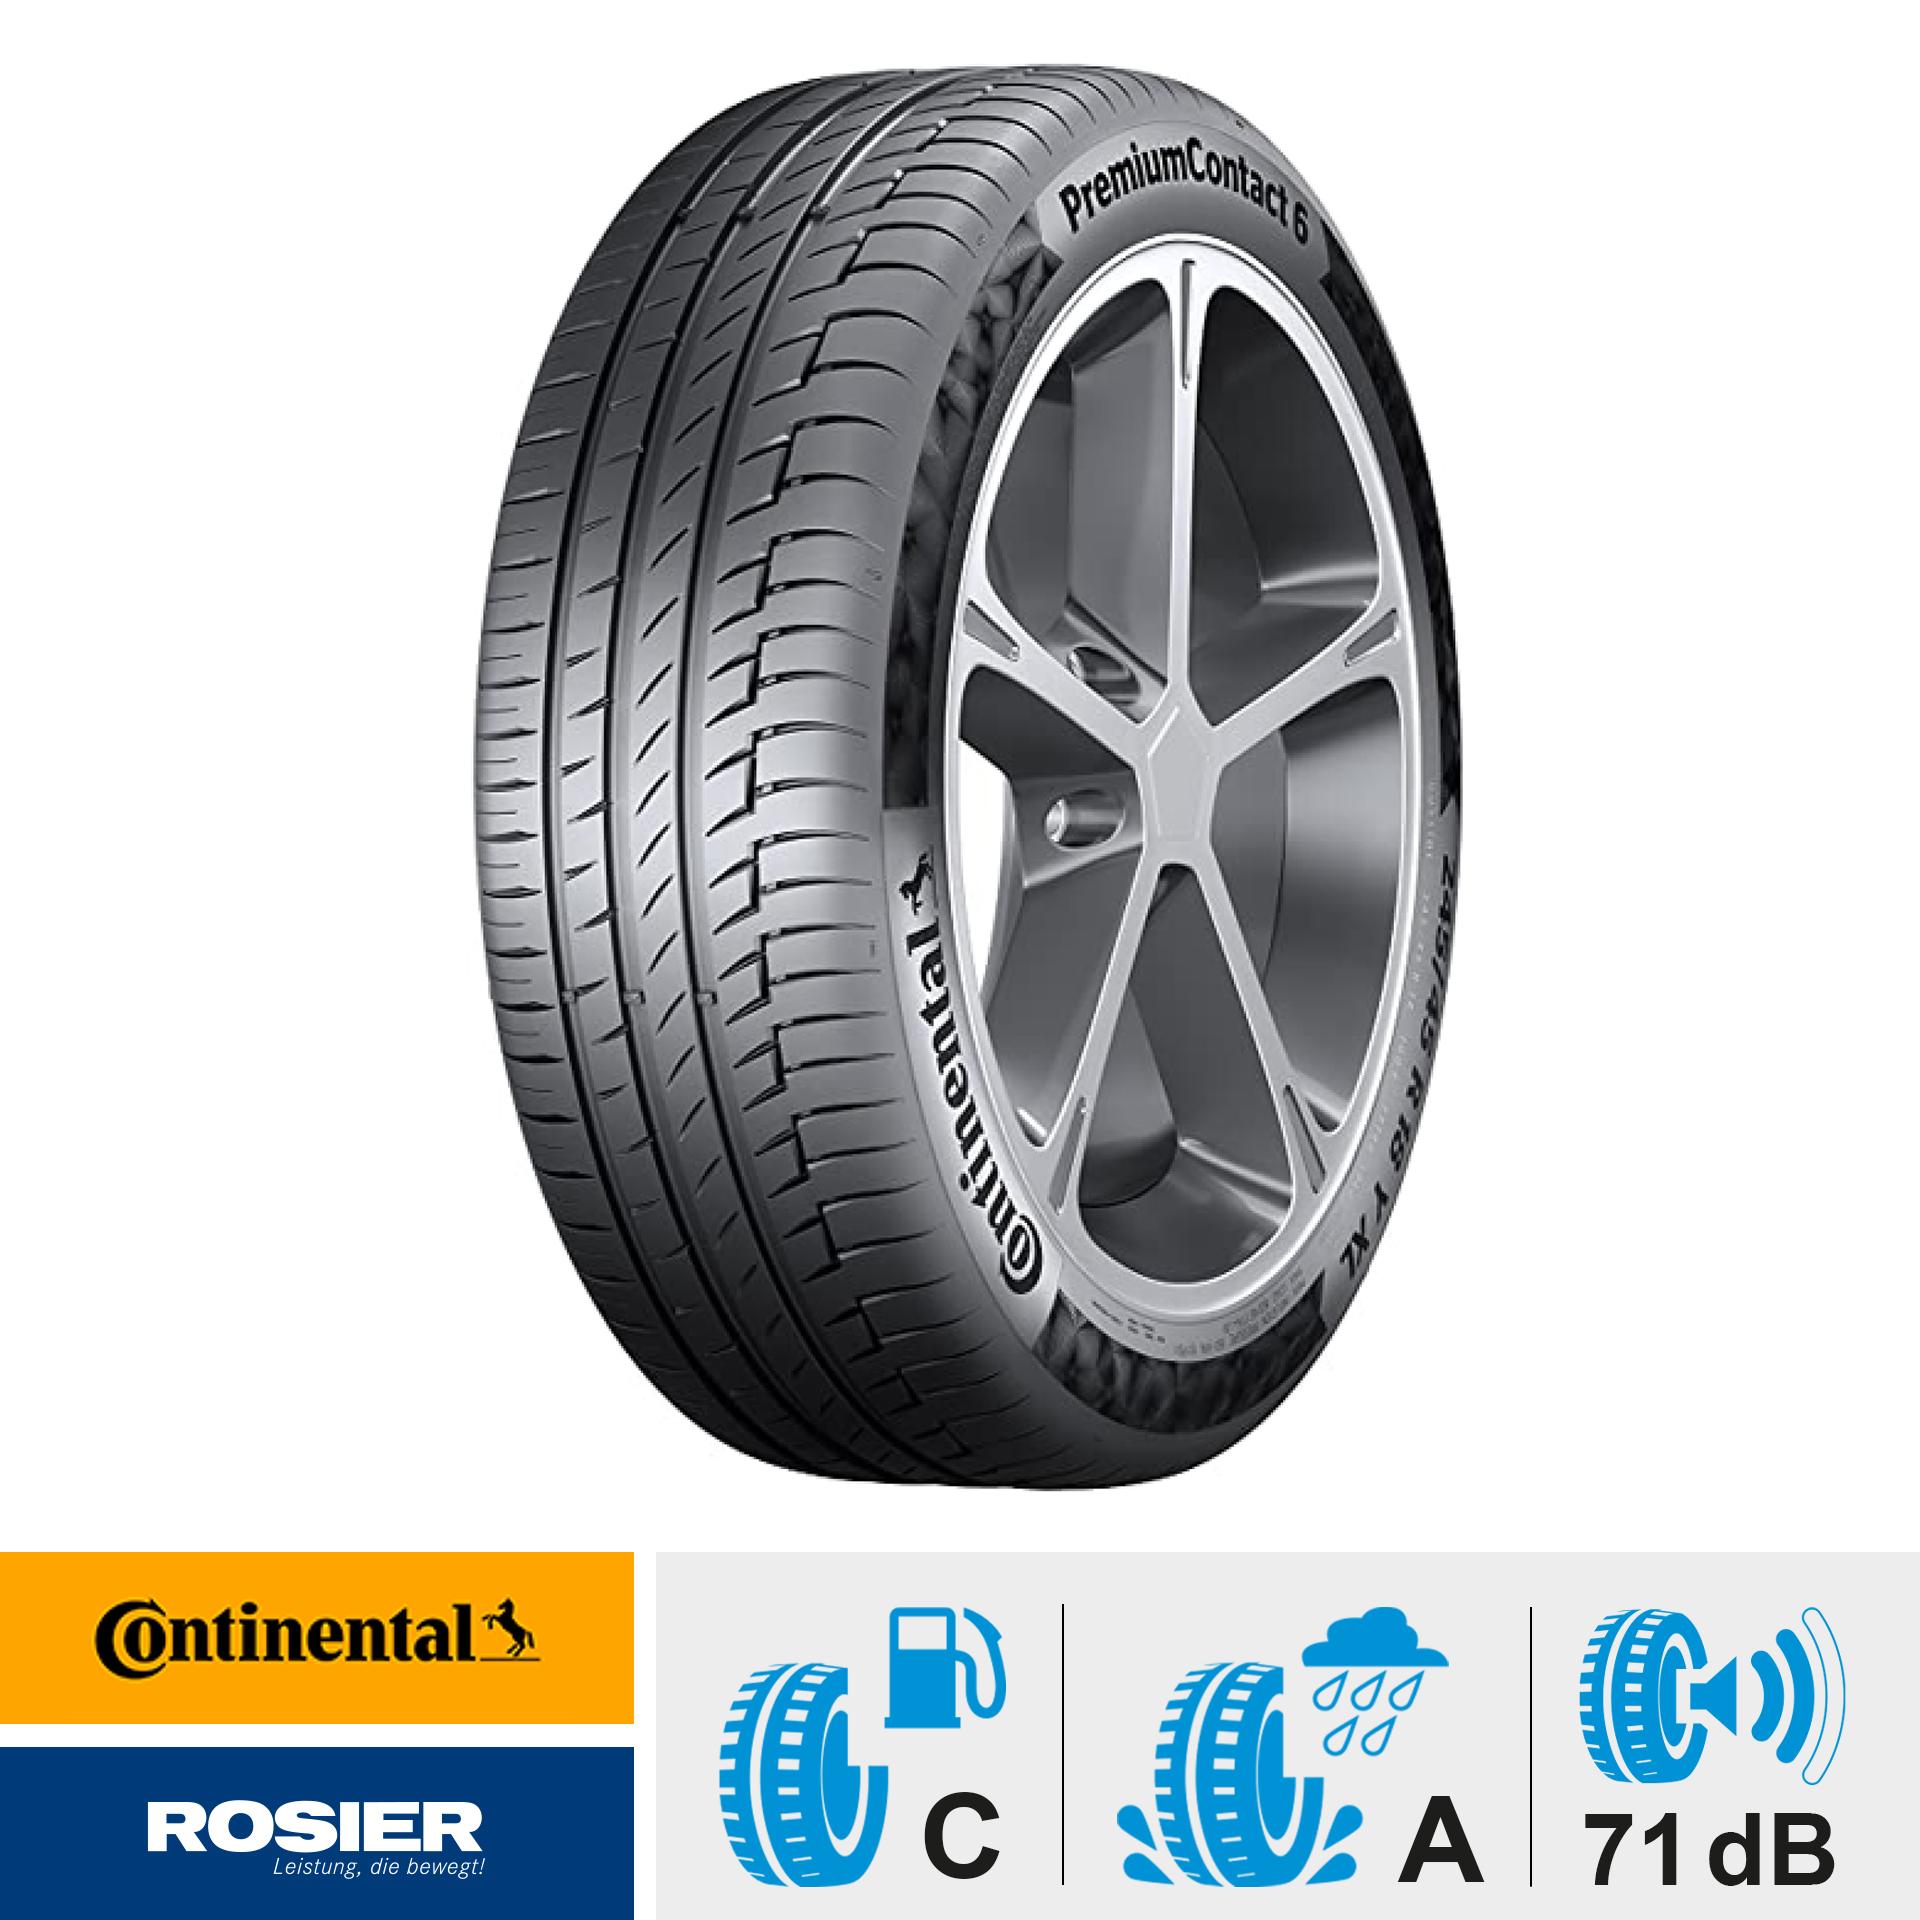 Continental PremiumContact 6 225/45 R 17 91Y - Sommerreifen